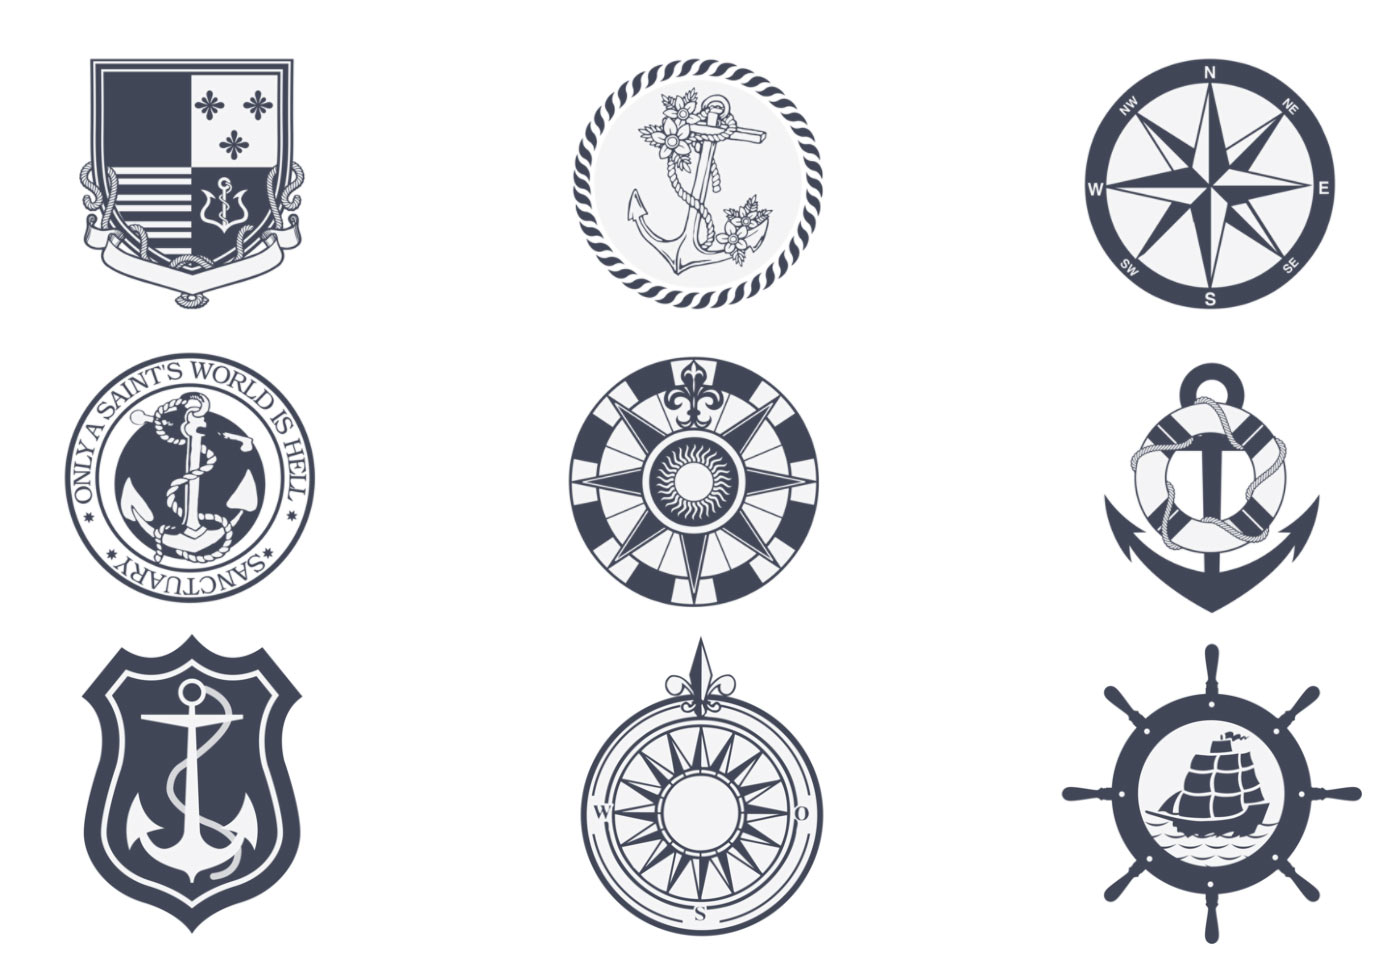 Nautical Symbols And Meanings Vintage Nautical Symbols